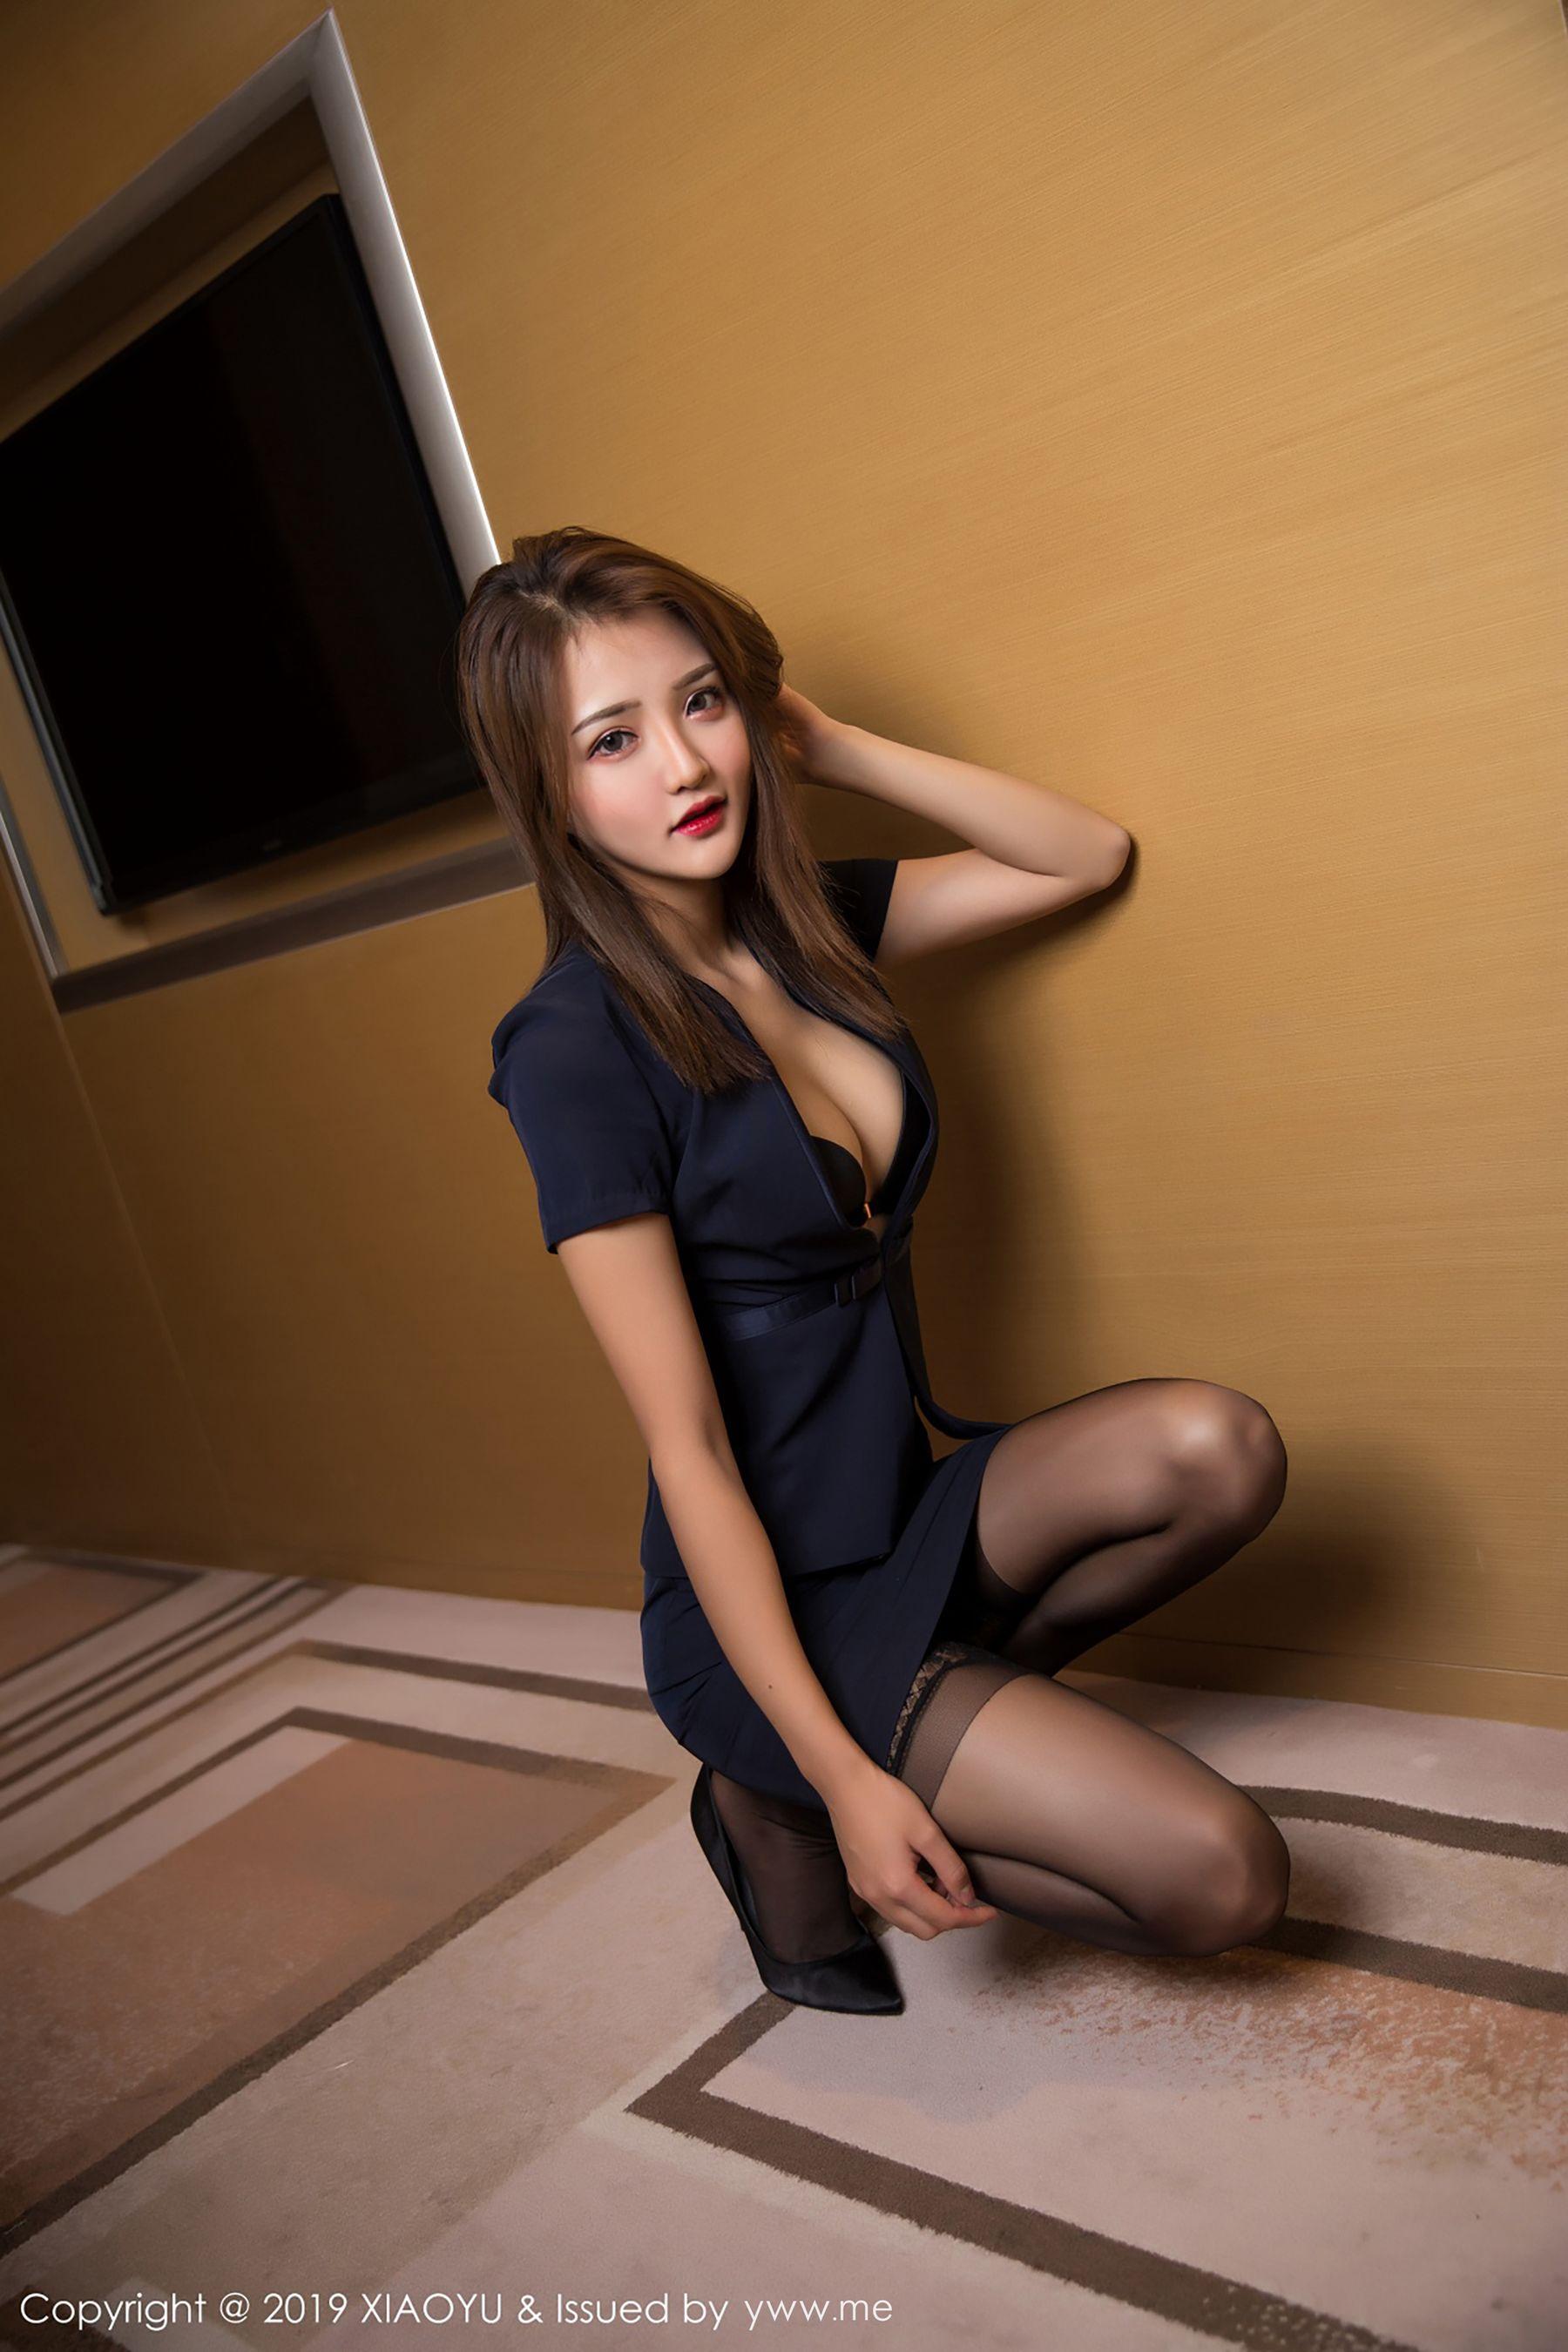 VOL.1895 [语画界]丝袜美腿丝袜女郎丝袜短裙:Miko酱吖(Miko酱)超高清写真套图(56P)